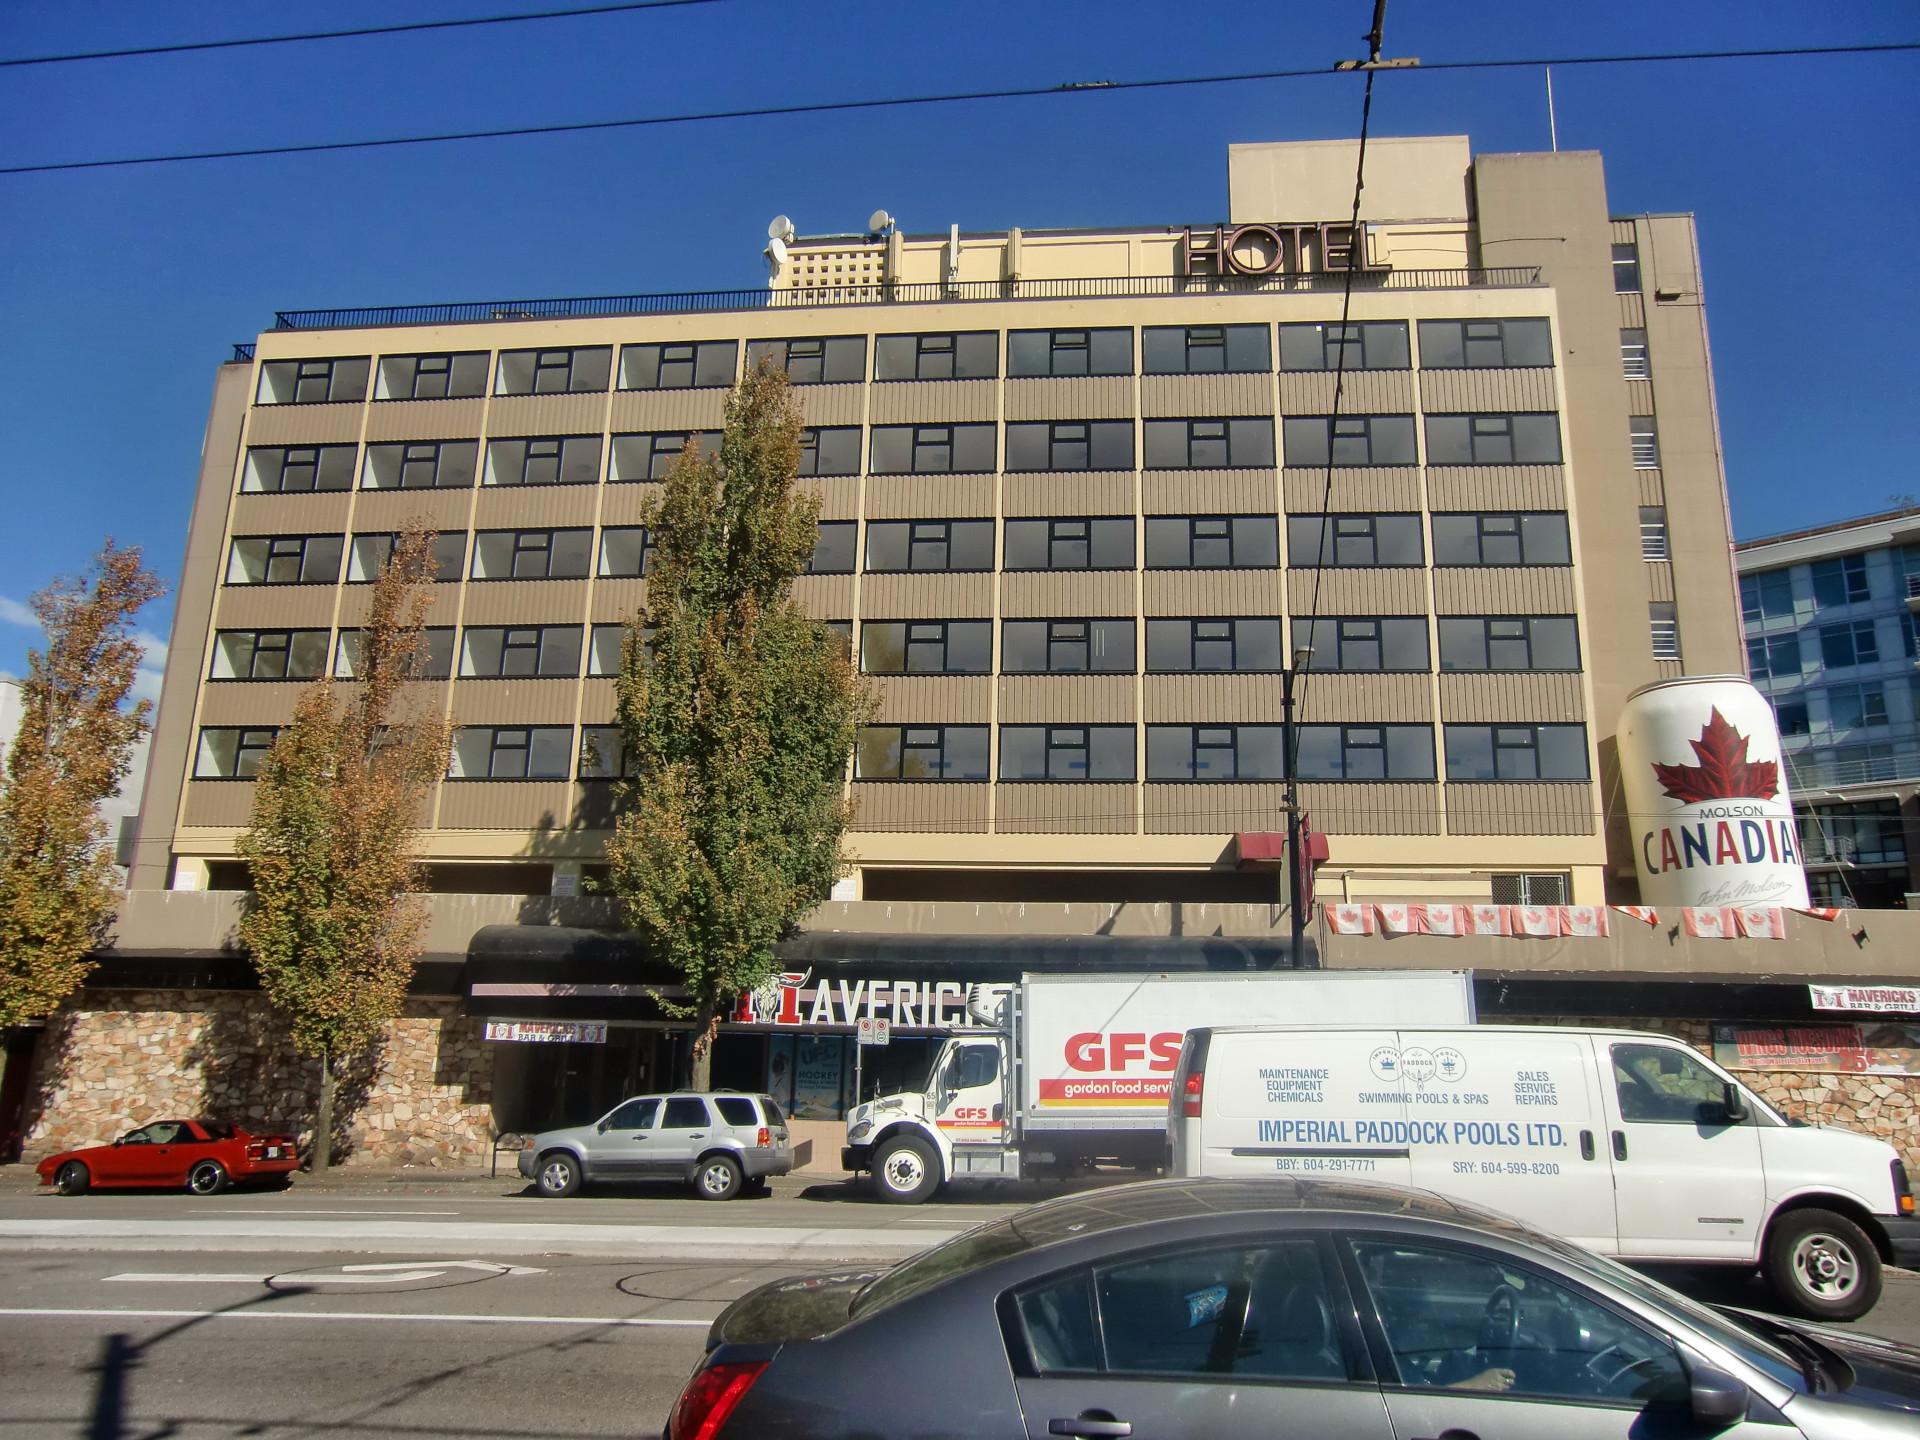 A1 windows 350 series windows on hotel